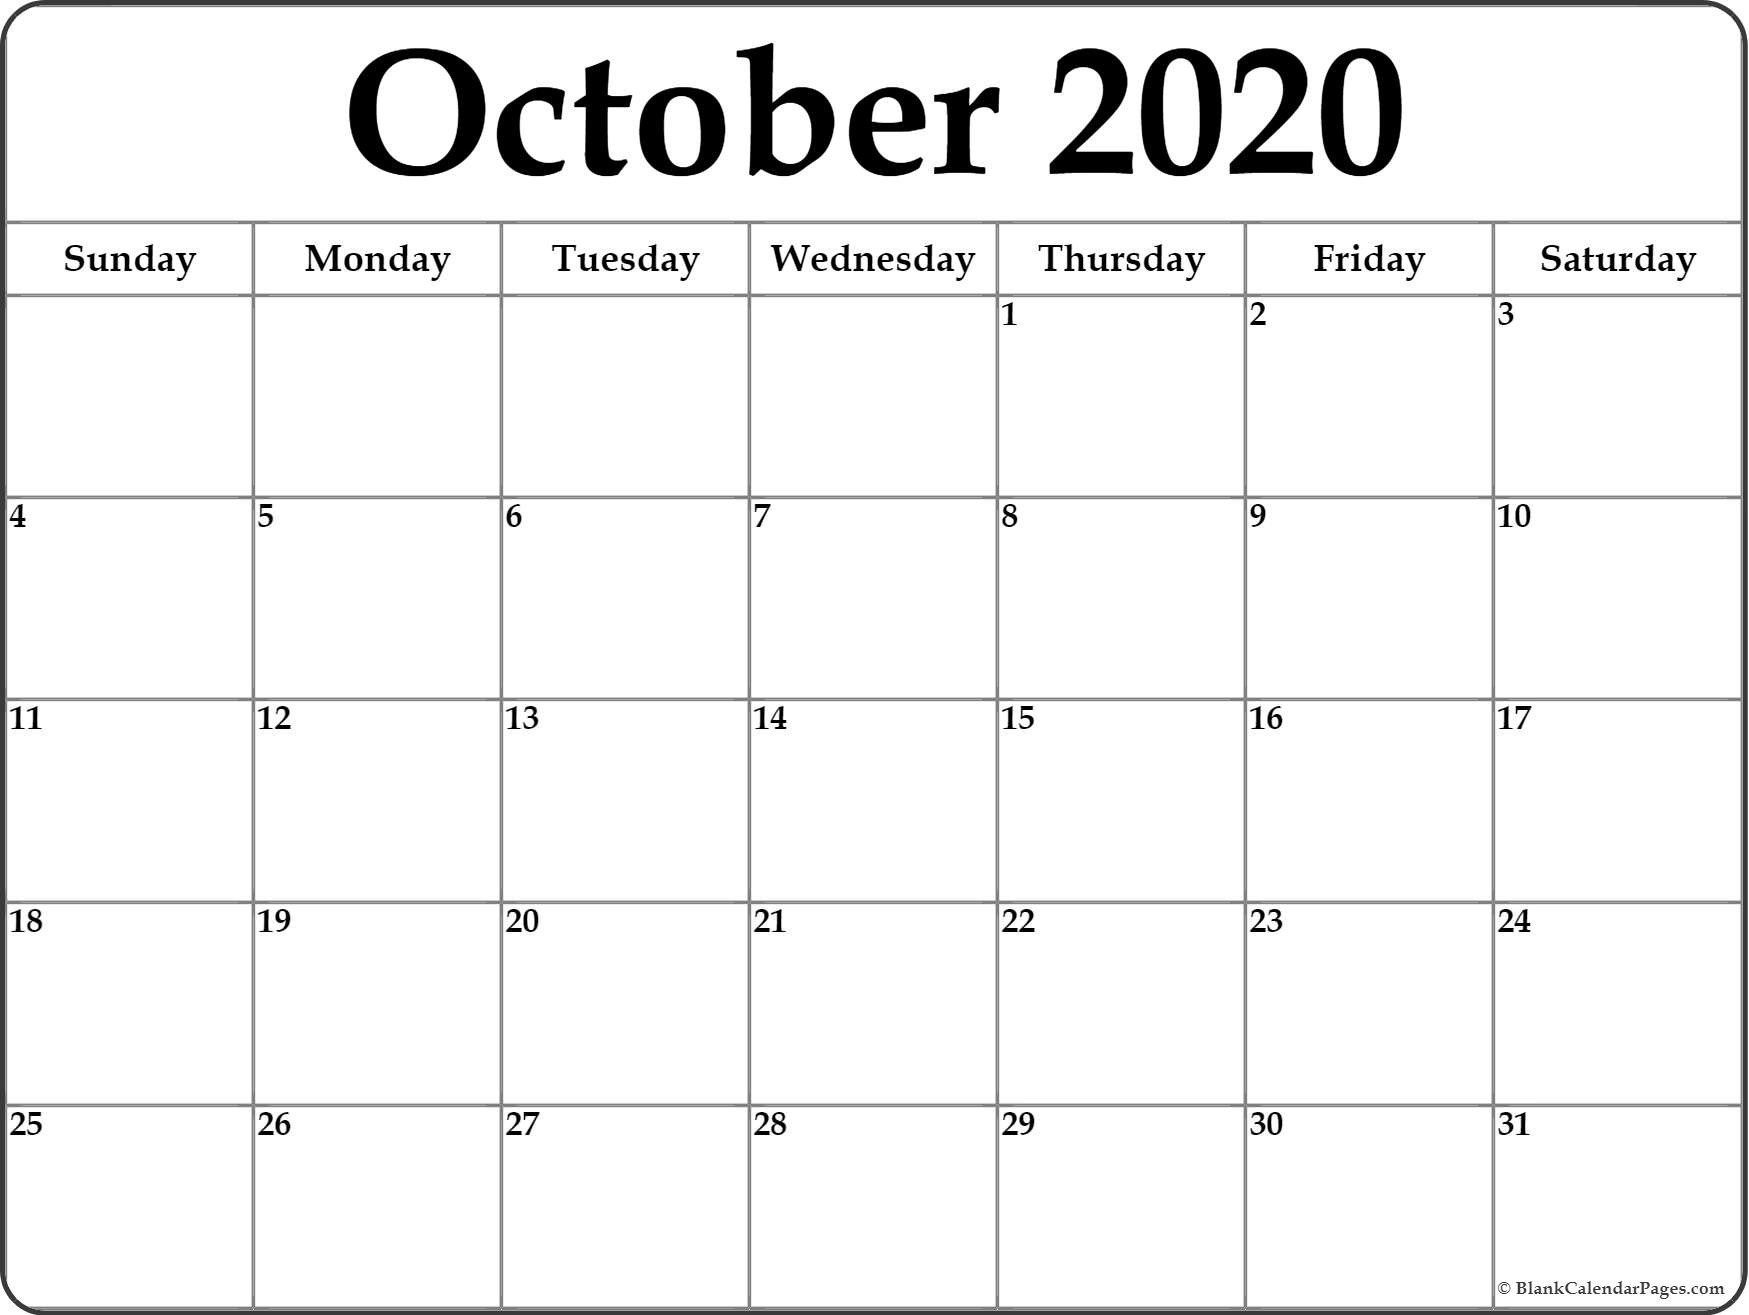 October 2020 Calendar Free Printable